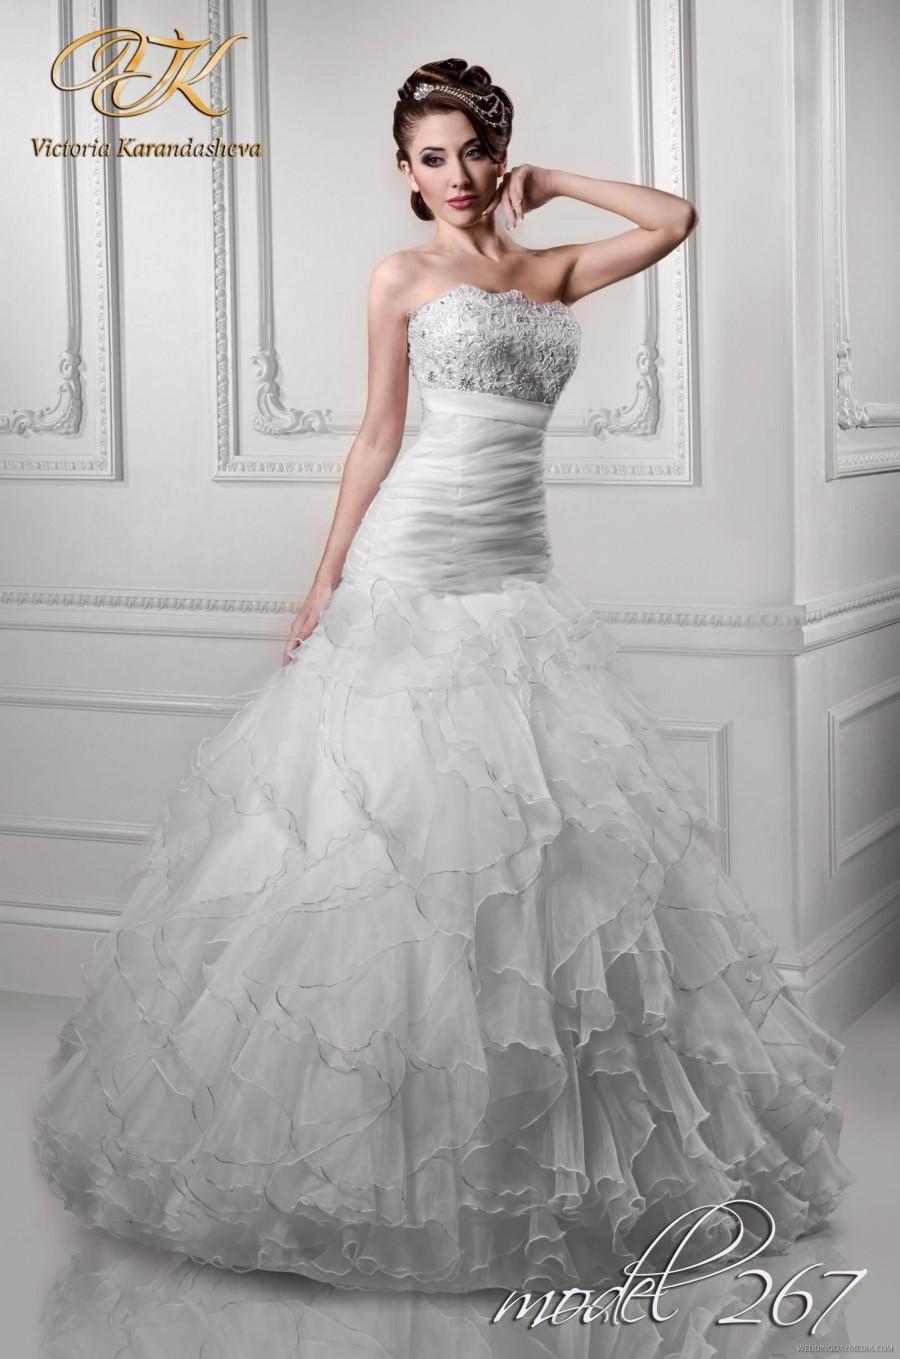 Wedding - Viktoria Karandasheva 267 Viktoria Karandasheva Wedding Dresses Suite 2016 - Rosy Bridesmaid Dresses